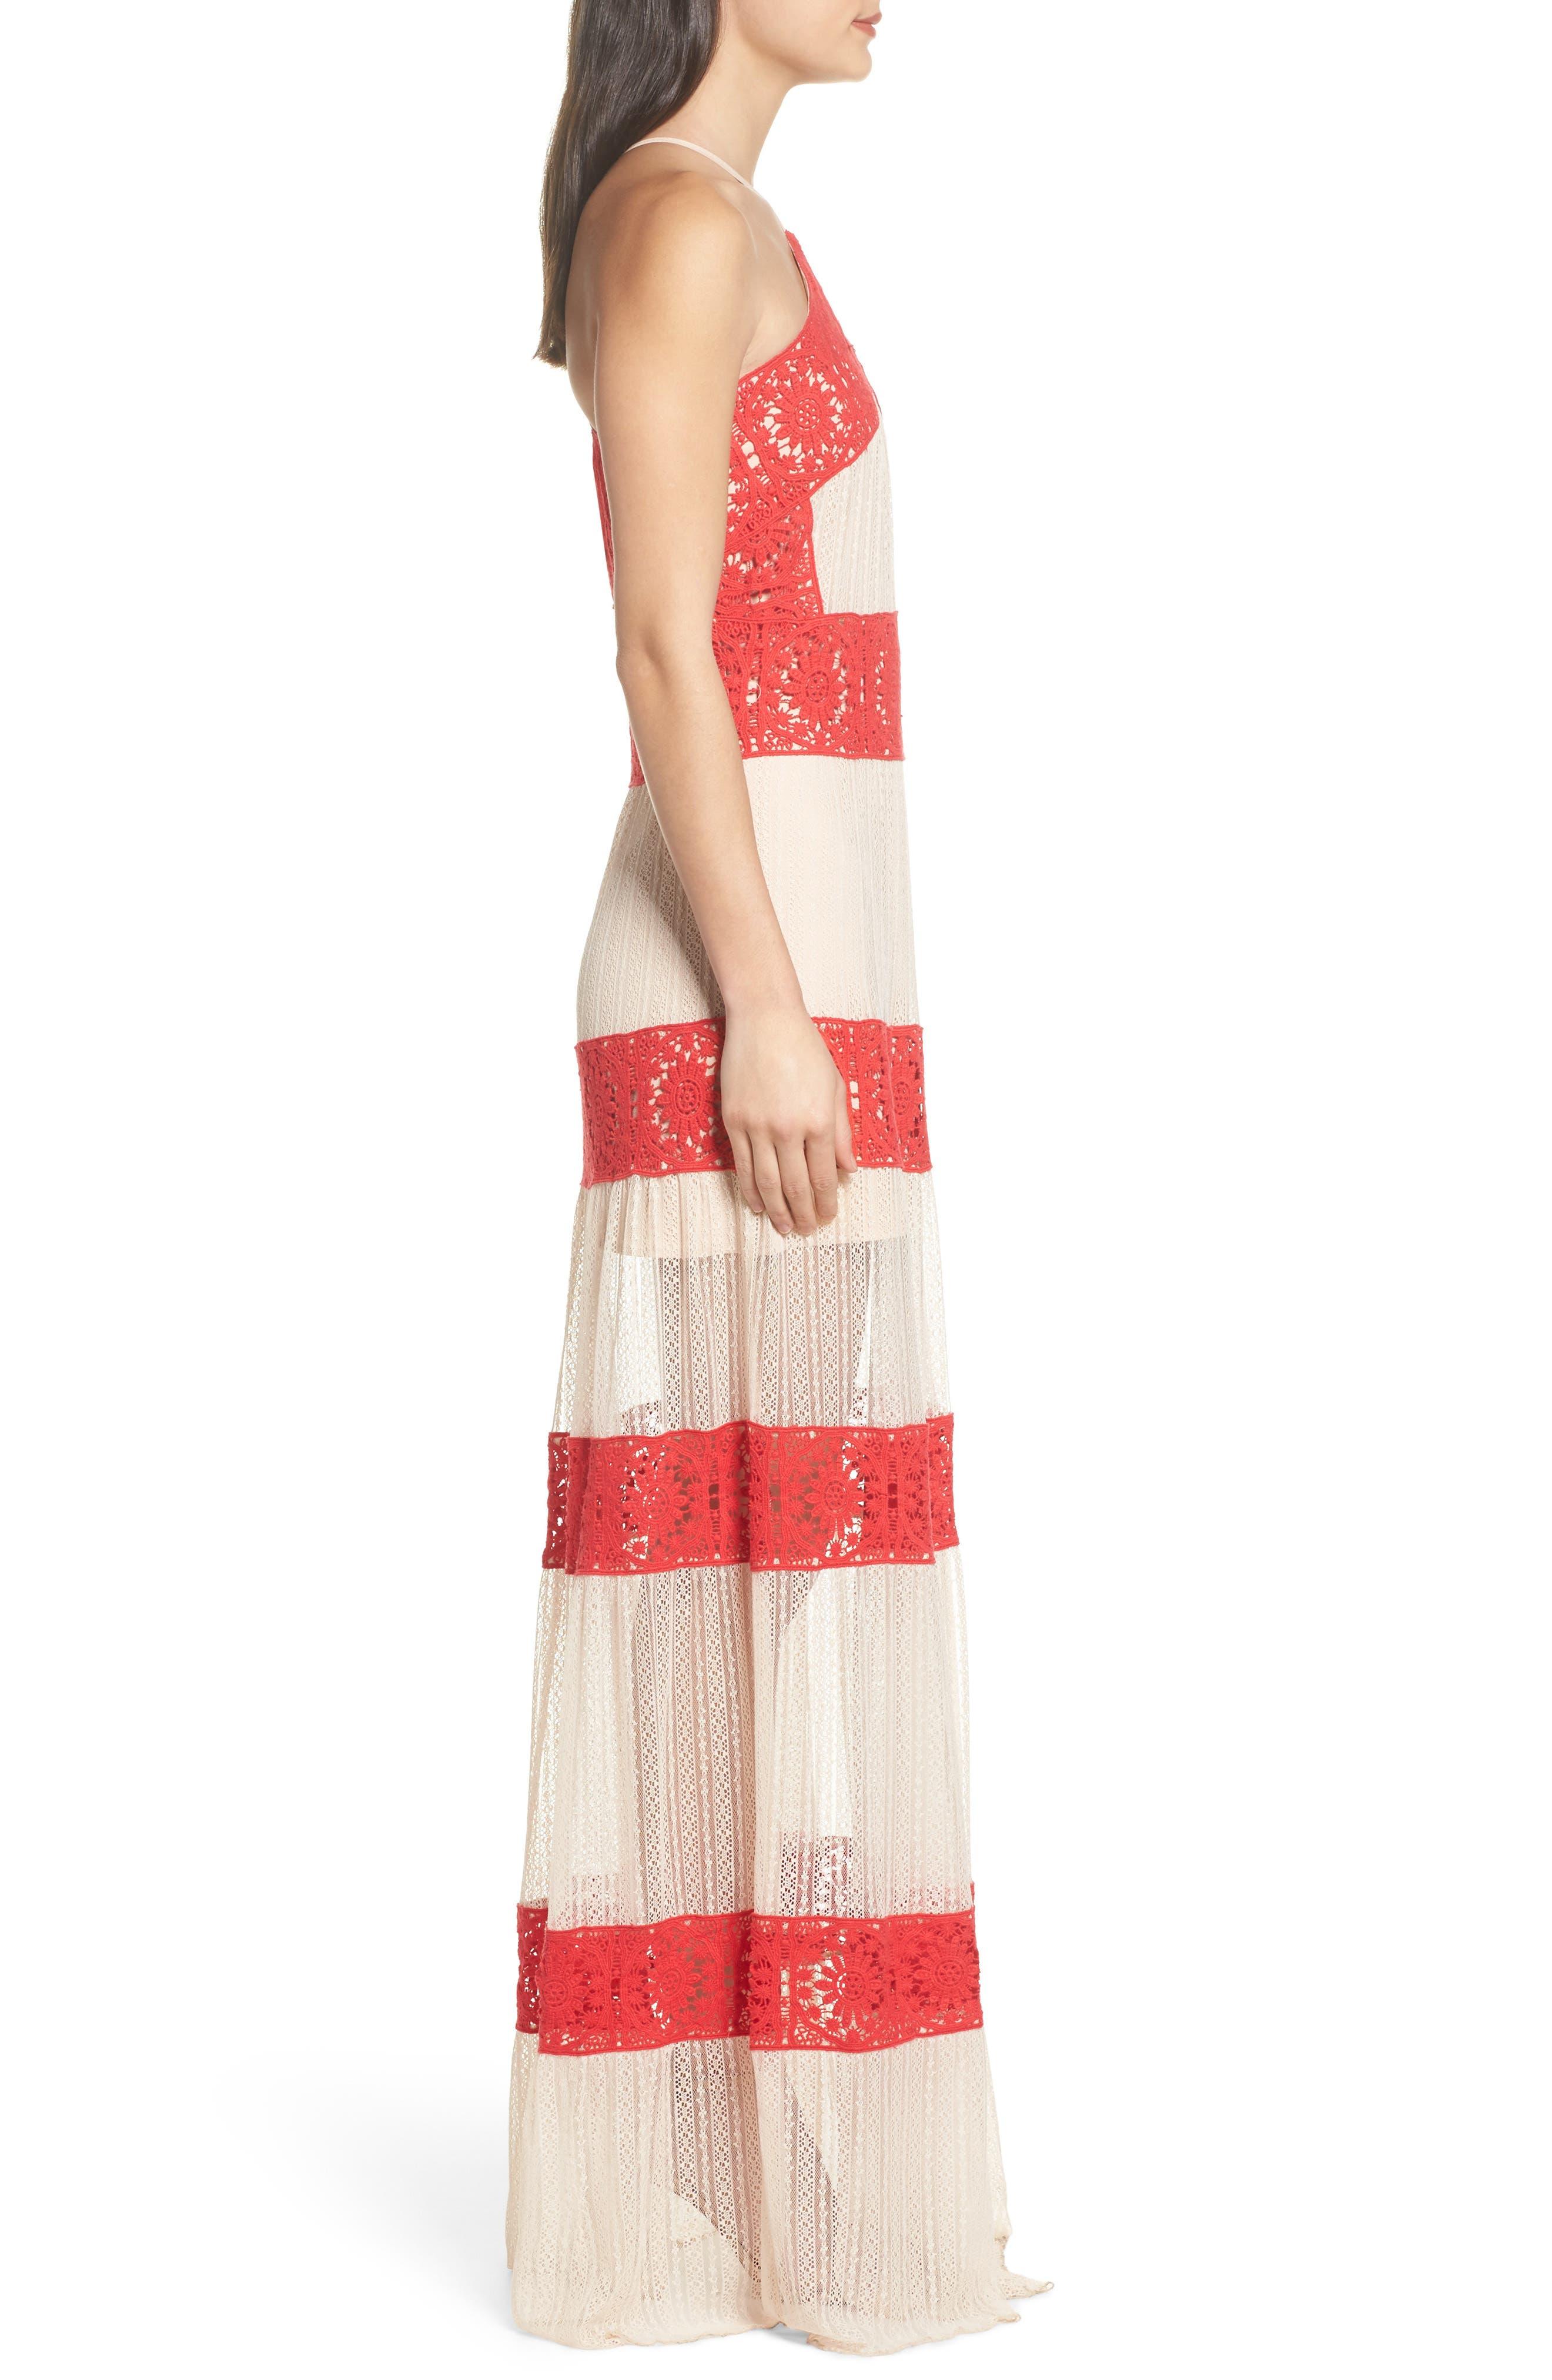 Ophelia Two-Tone Lace Maxi Dress,                             Alternate thumbnail 3, color,                             250